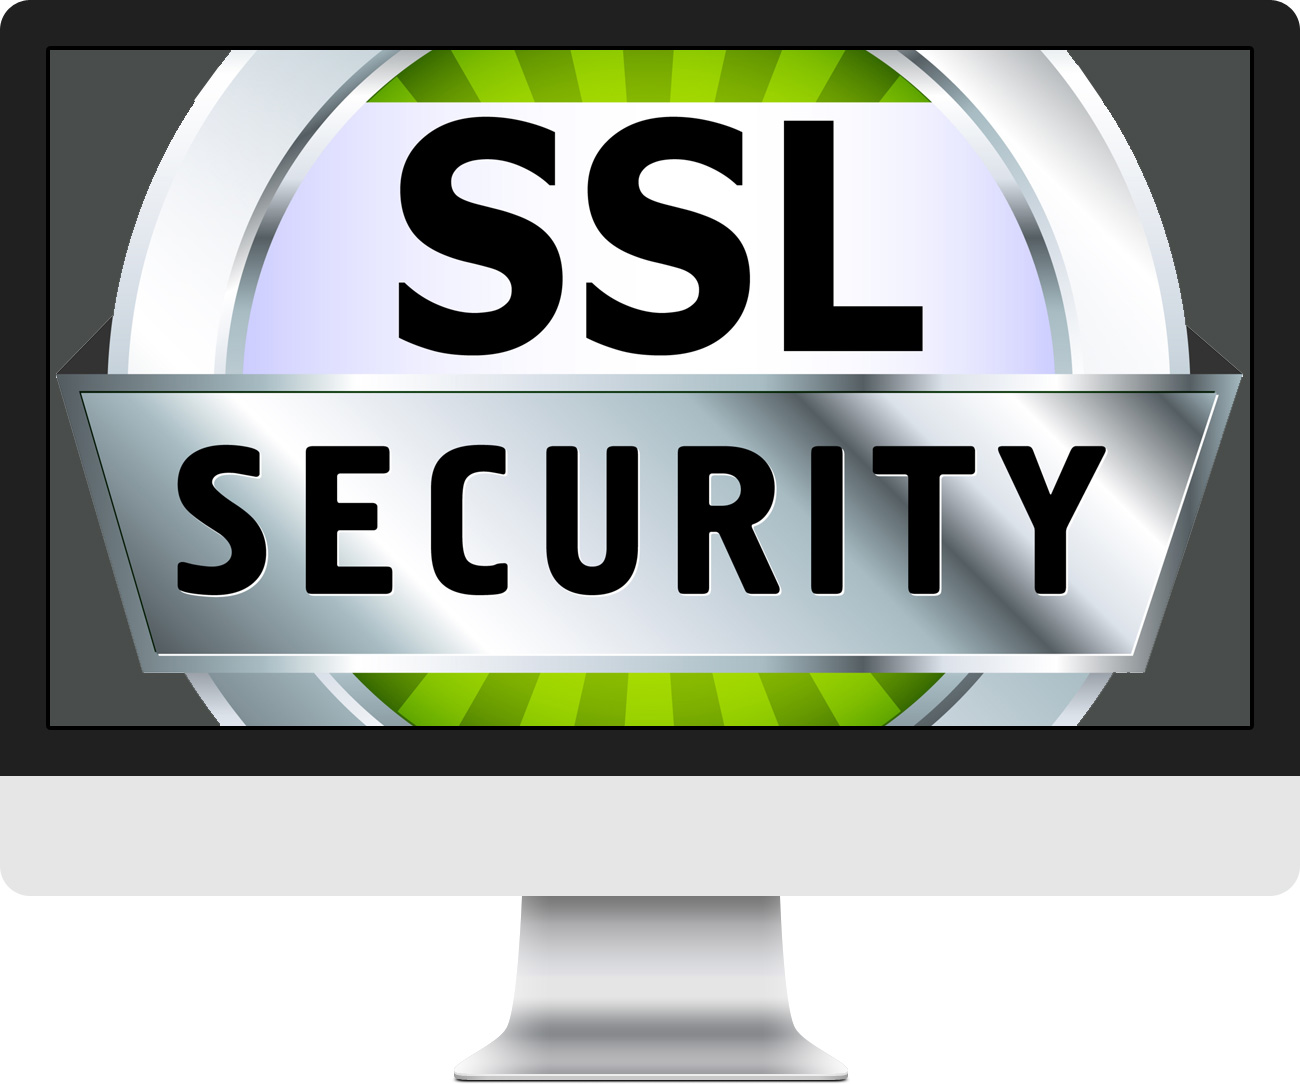 ssl security jagowebhosting